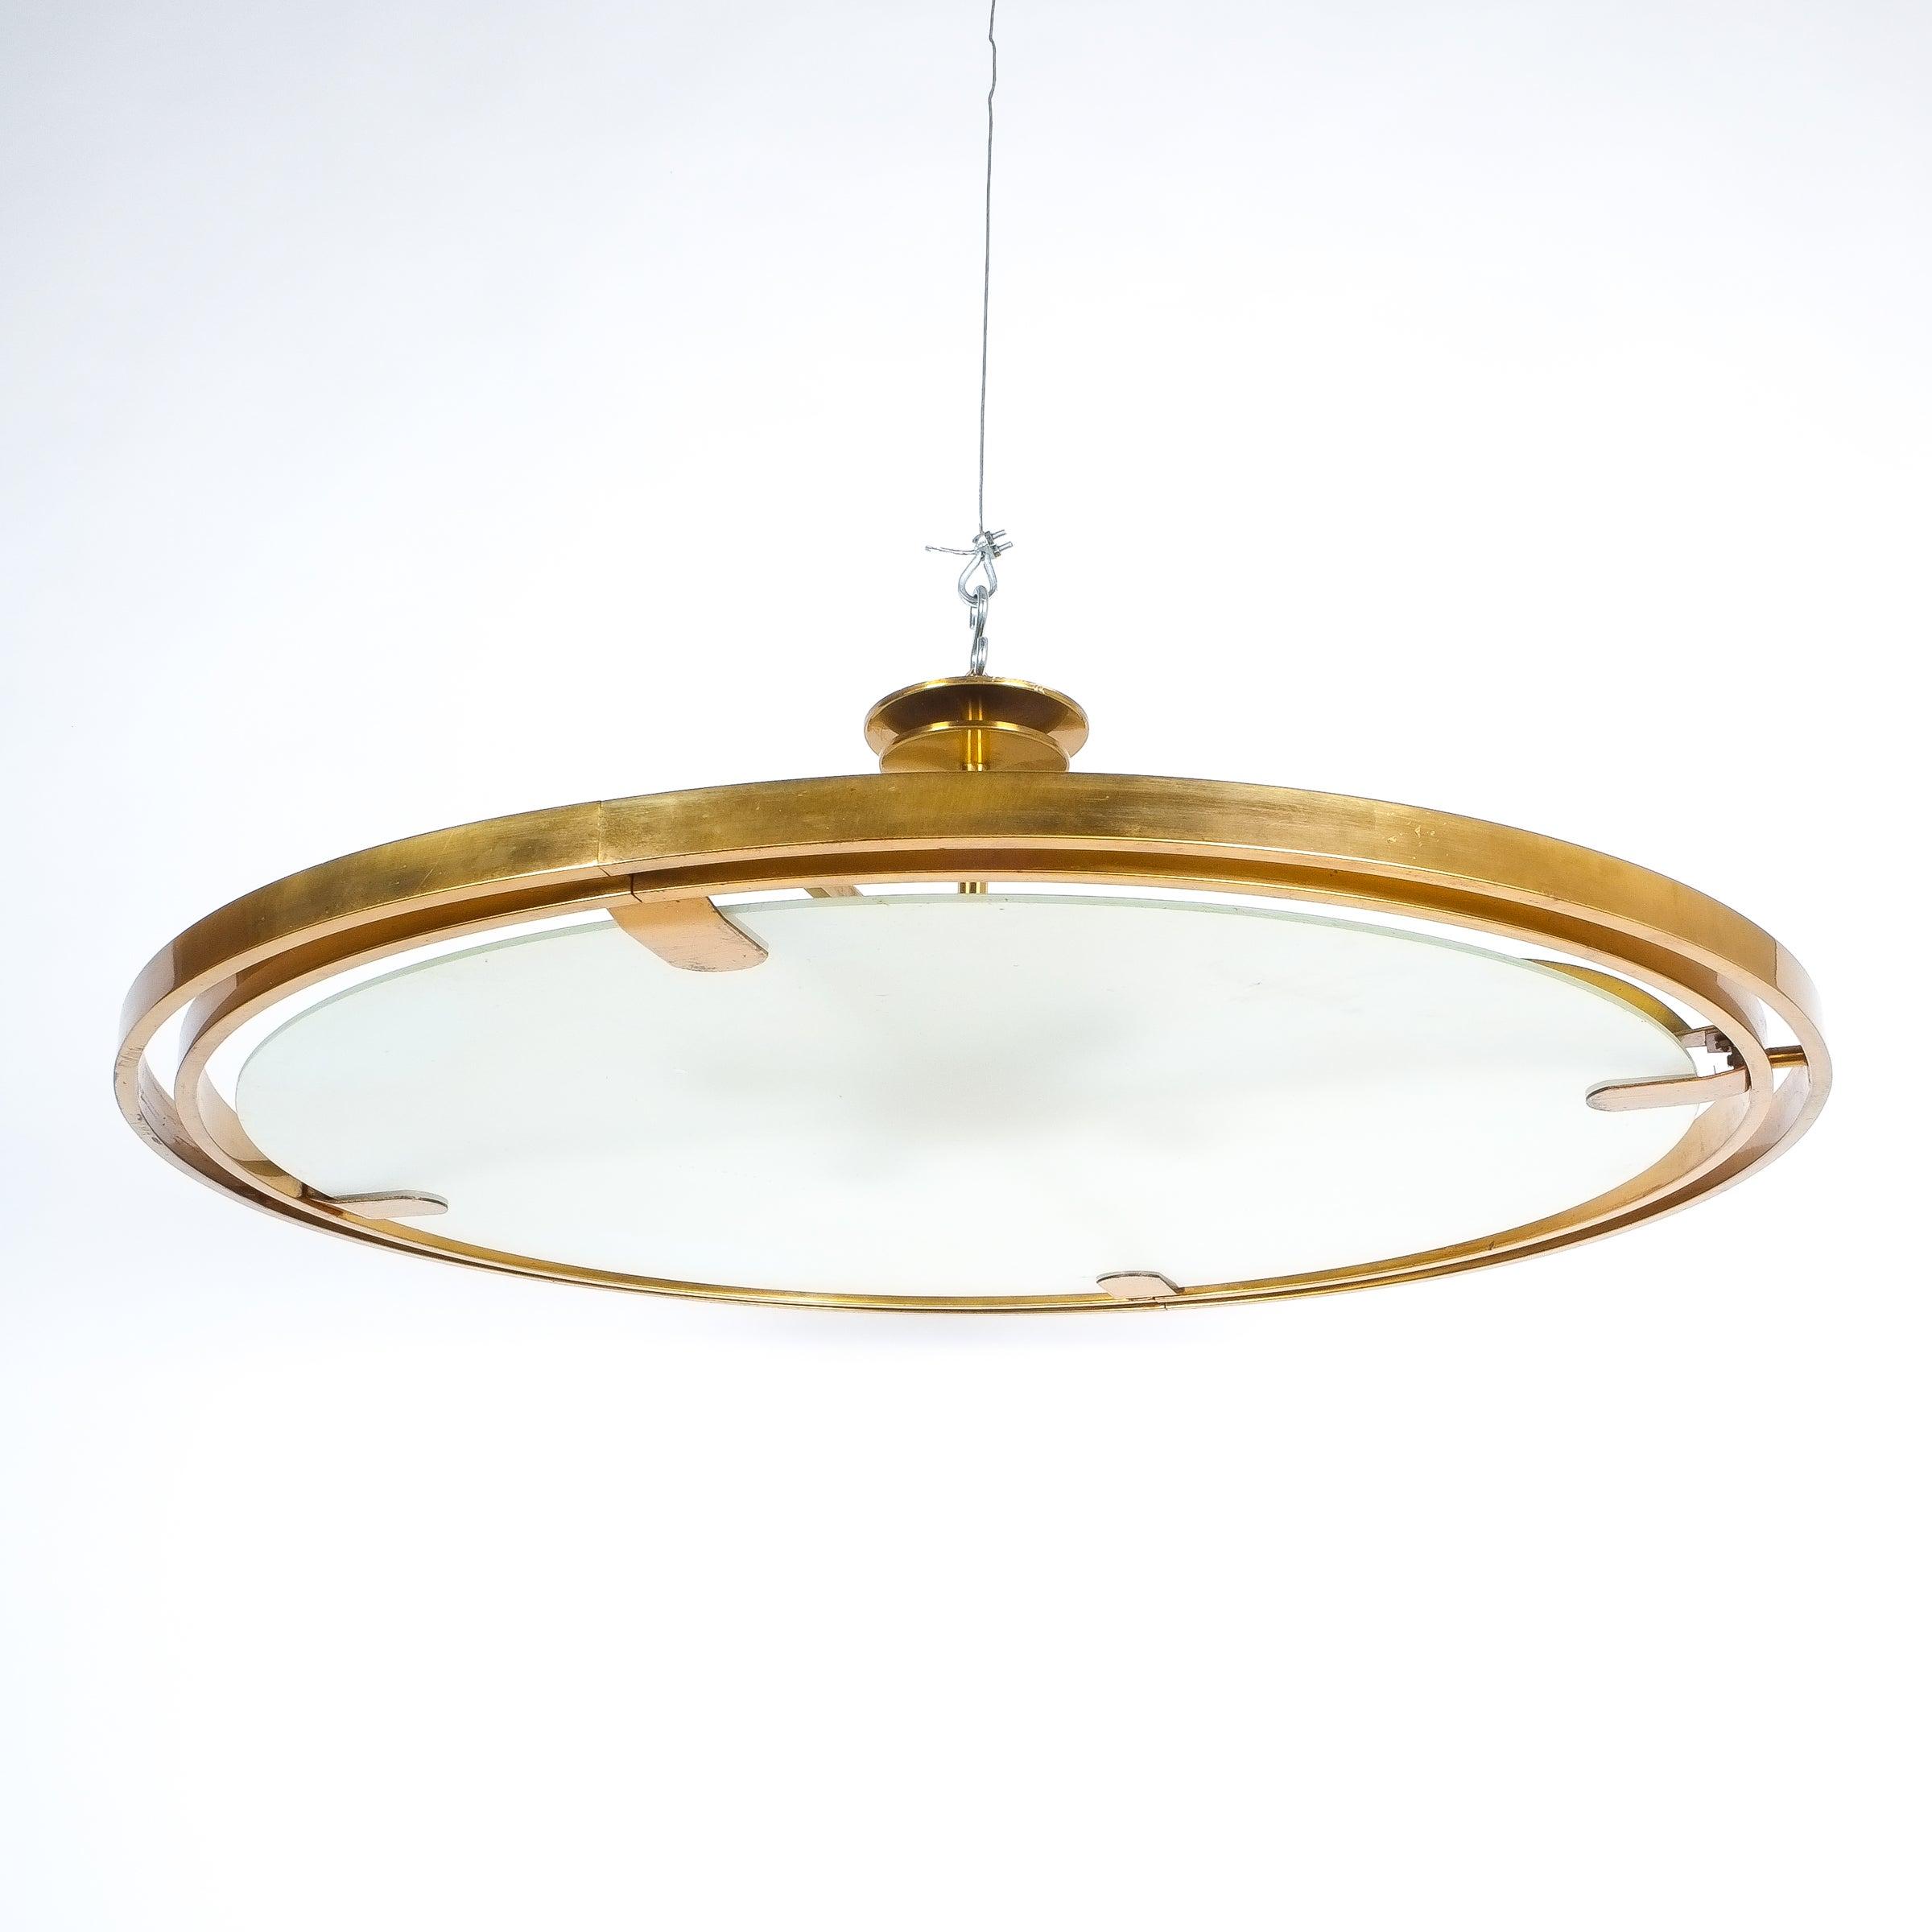 ceiling art clam deco bone vintage ceilings lighting img rag shell light